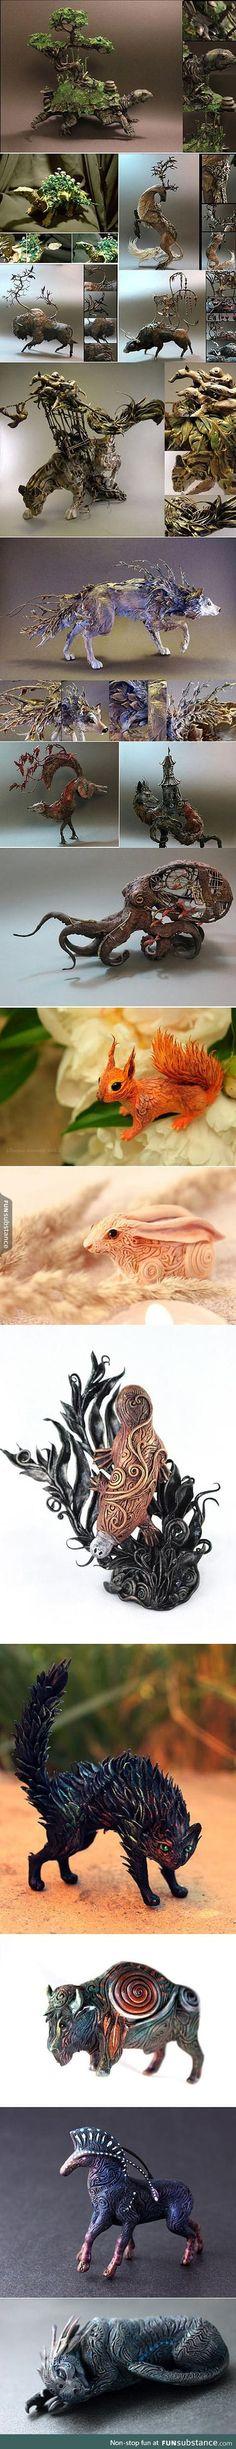 Mystical handmade animal sculptures